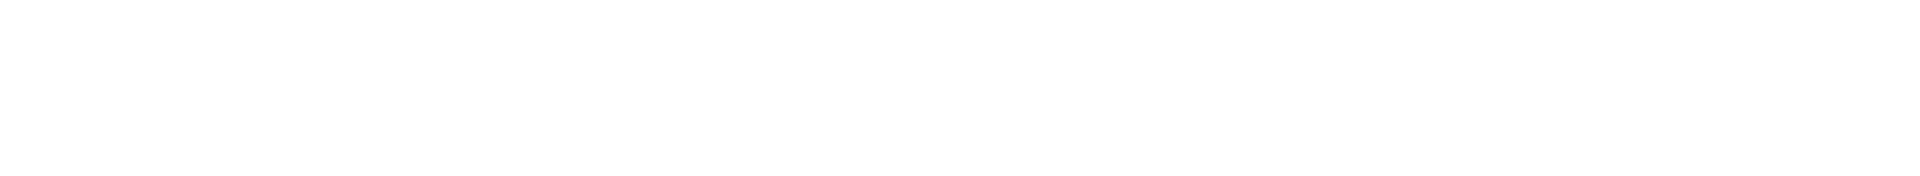 lethbridge Toyota Logo